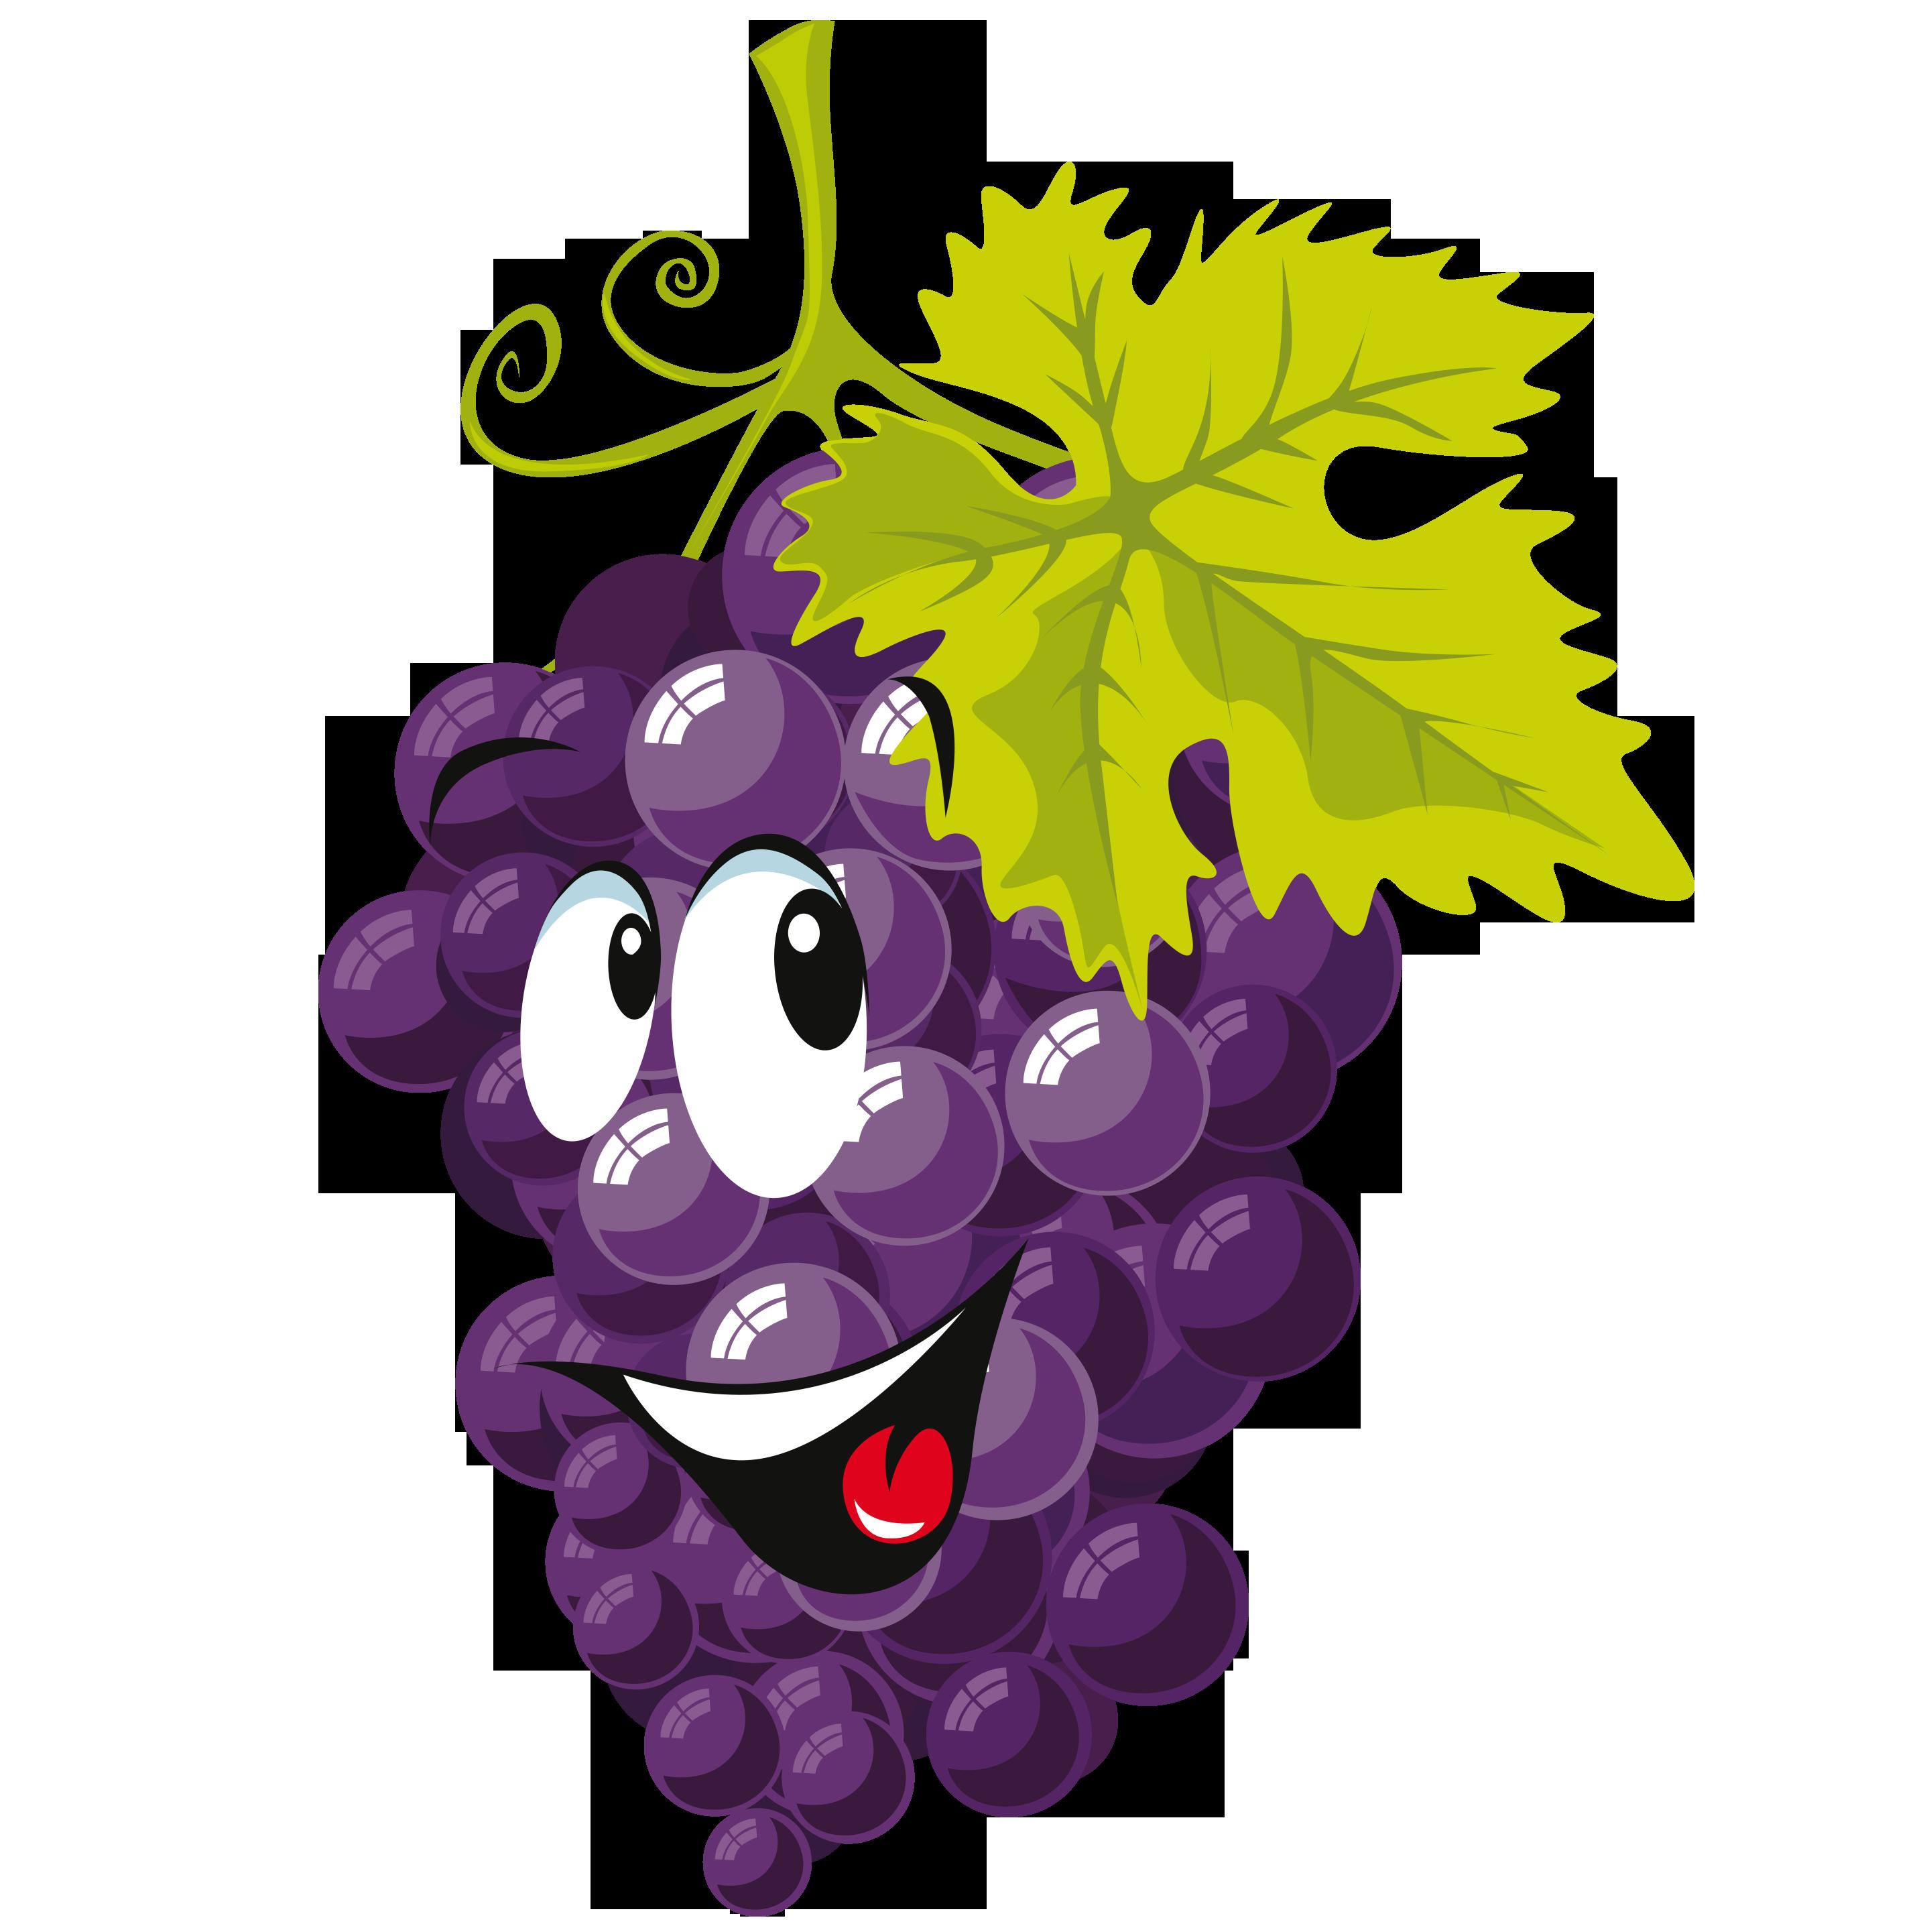 Весёлый виноград